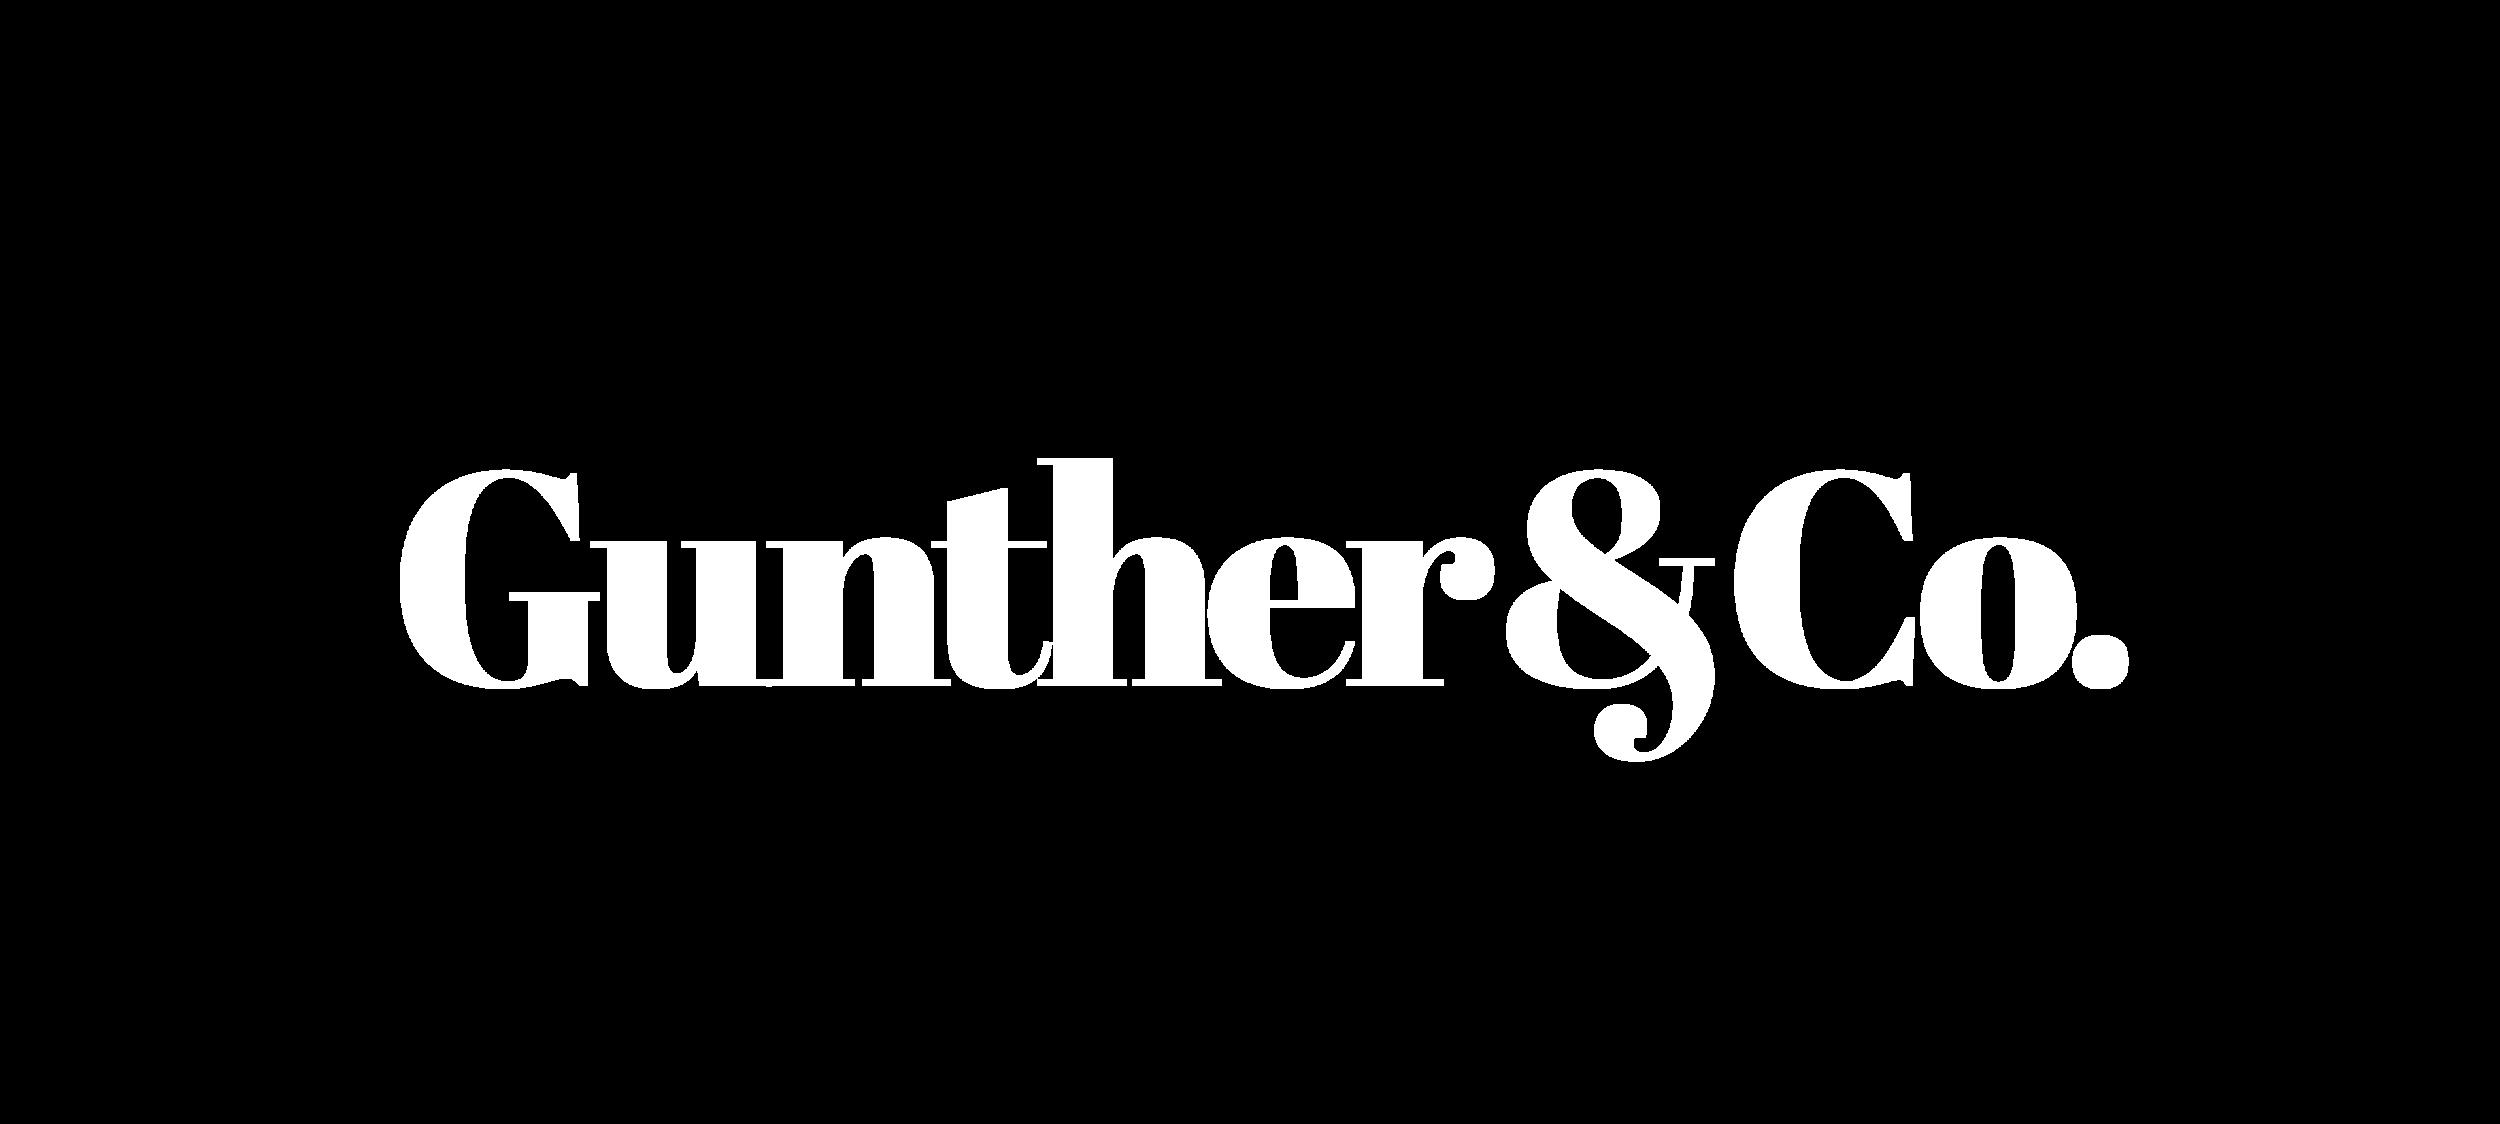 collins client logos-01.png